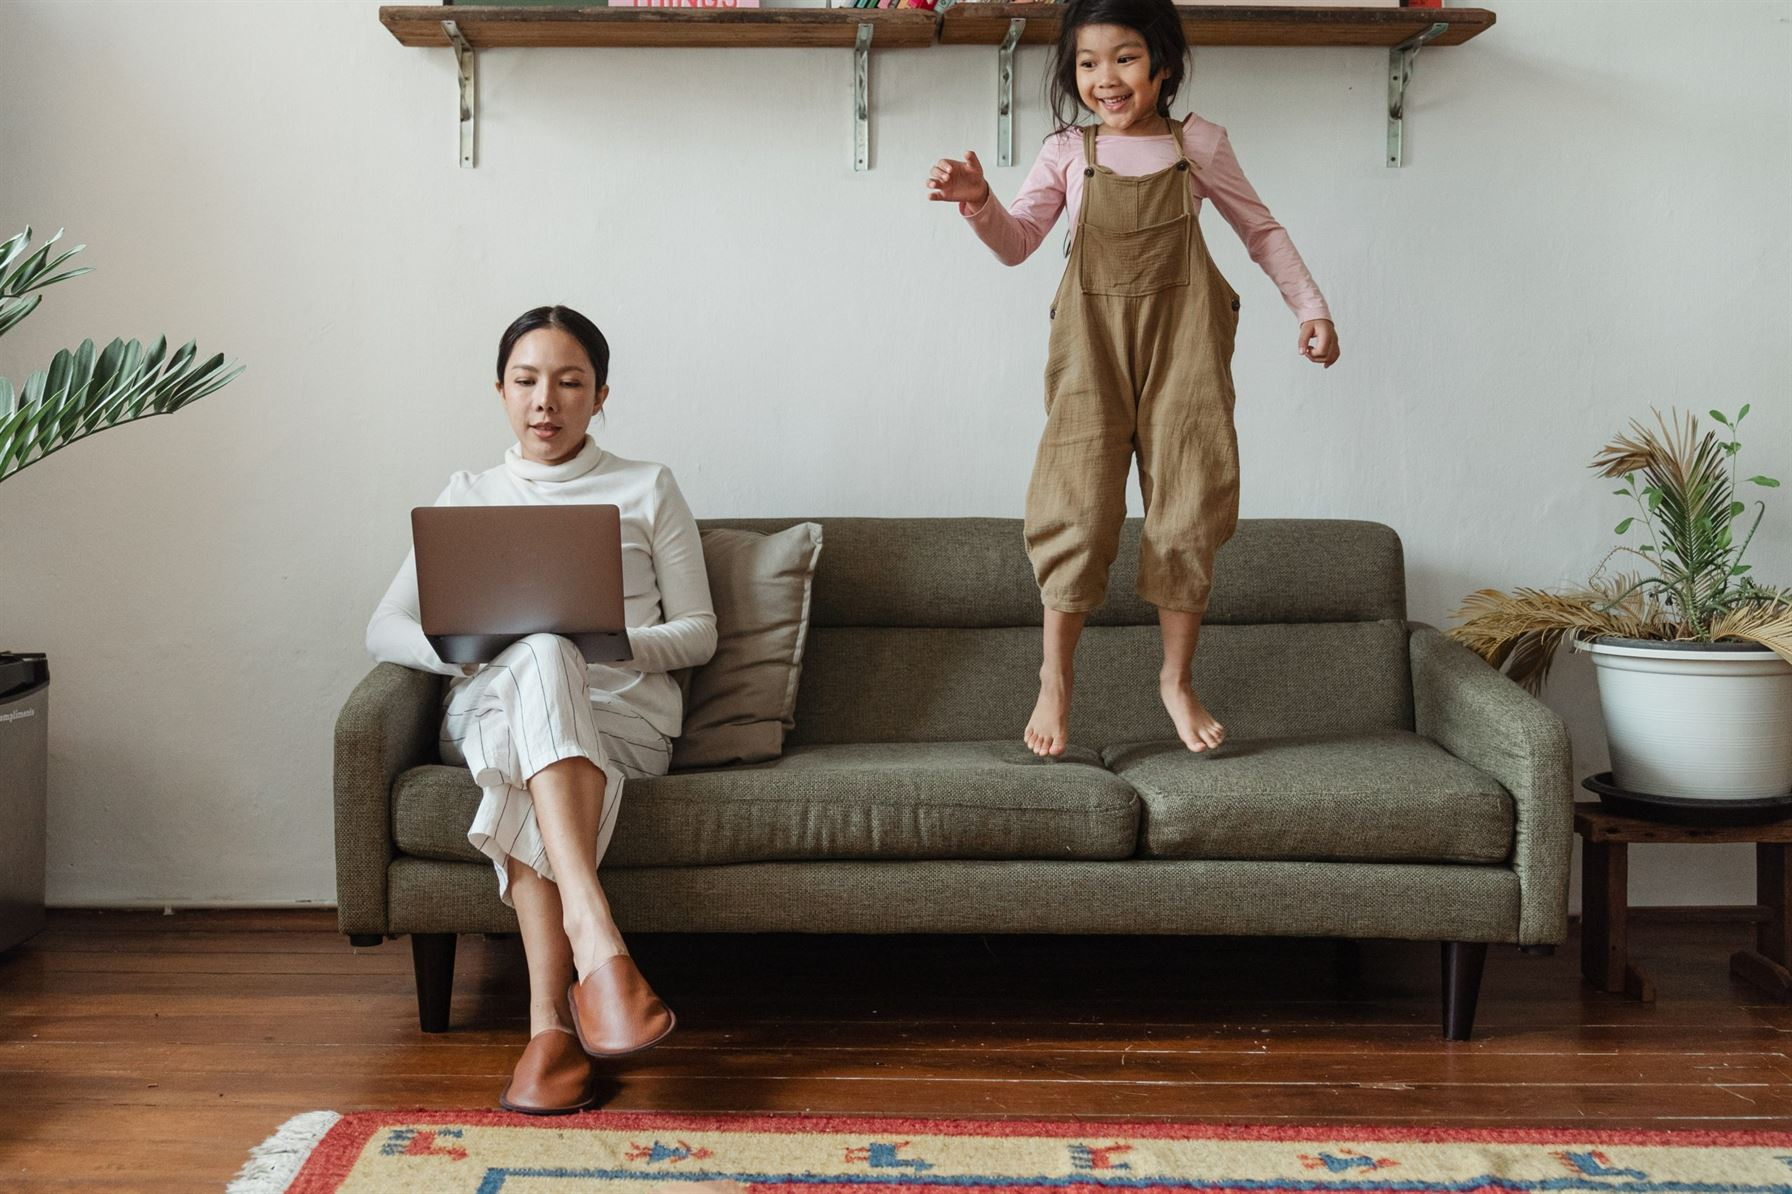 self-management for kids